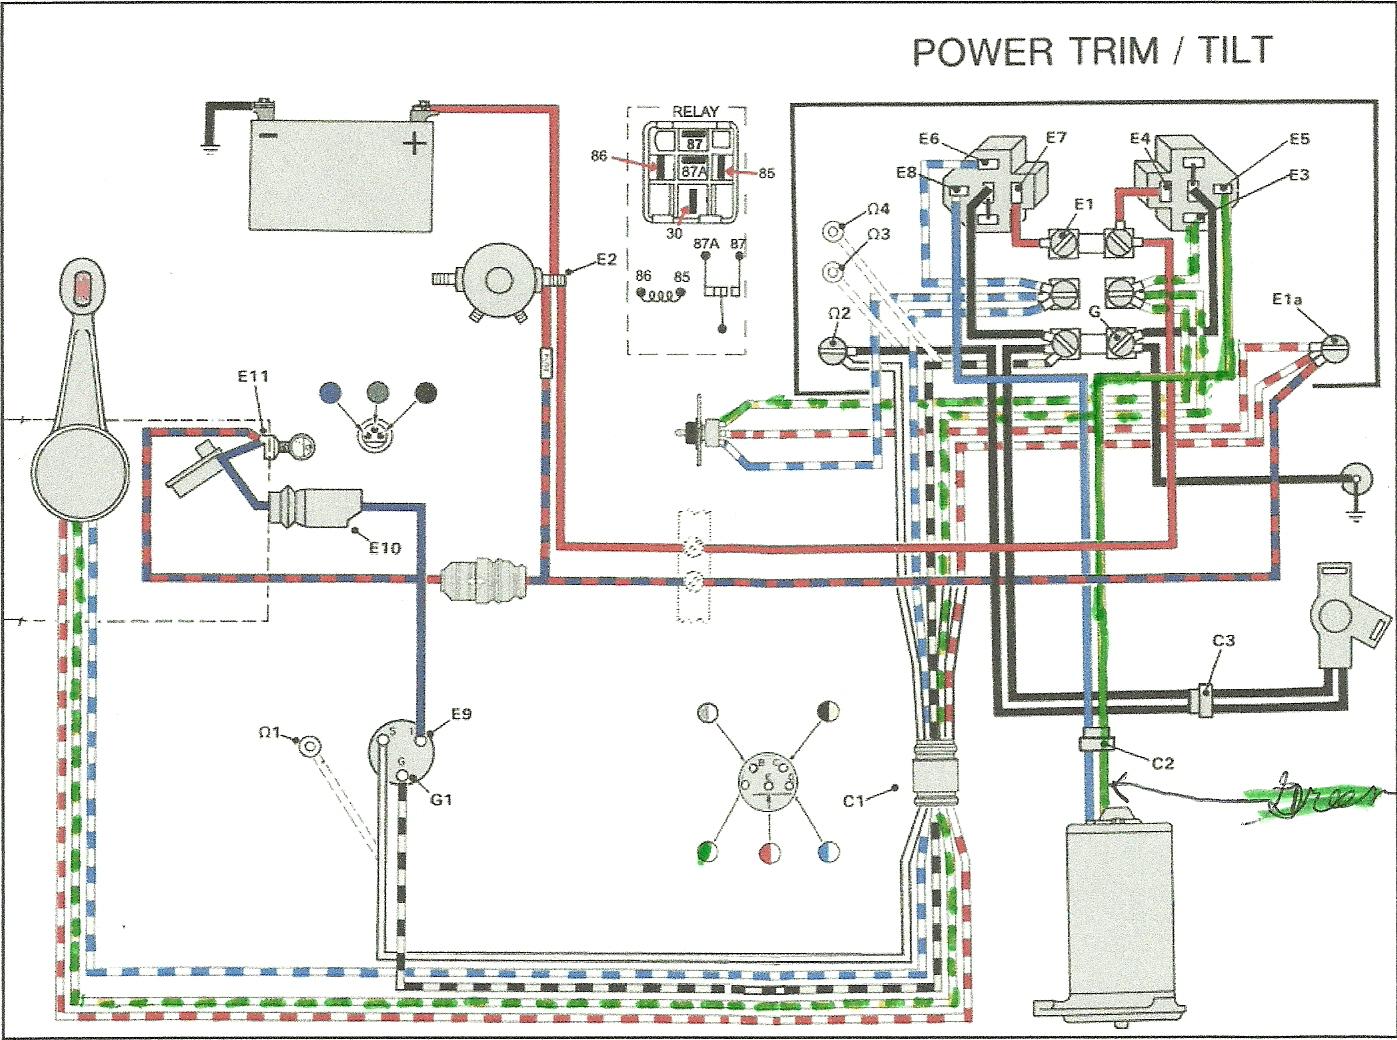 astounding wiring diagram engine tilt and trim suzuki df pictures 7 Liter OMC Marine Wiring Diagrams for 5 astounding wiring diagram engine tilt and trim suzuki df pictures Pontoon Boat Electrical Wiring Diagrams